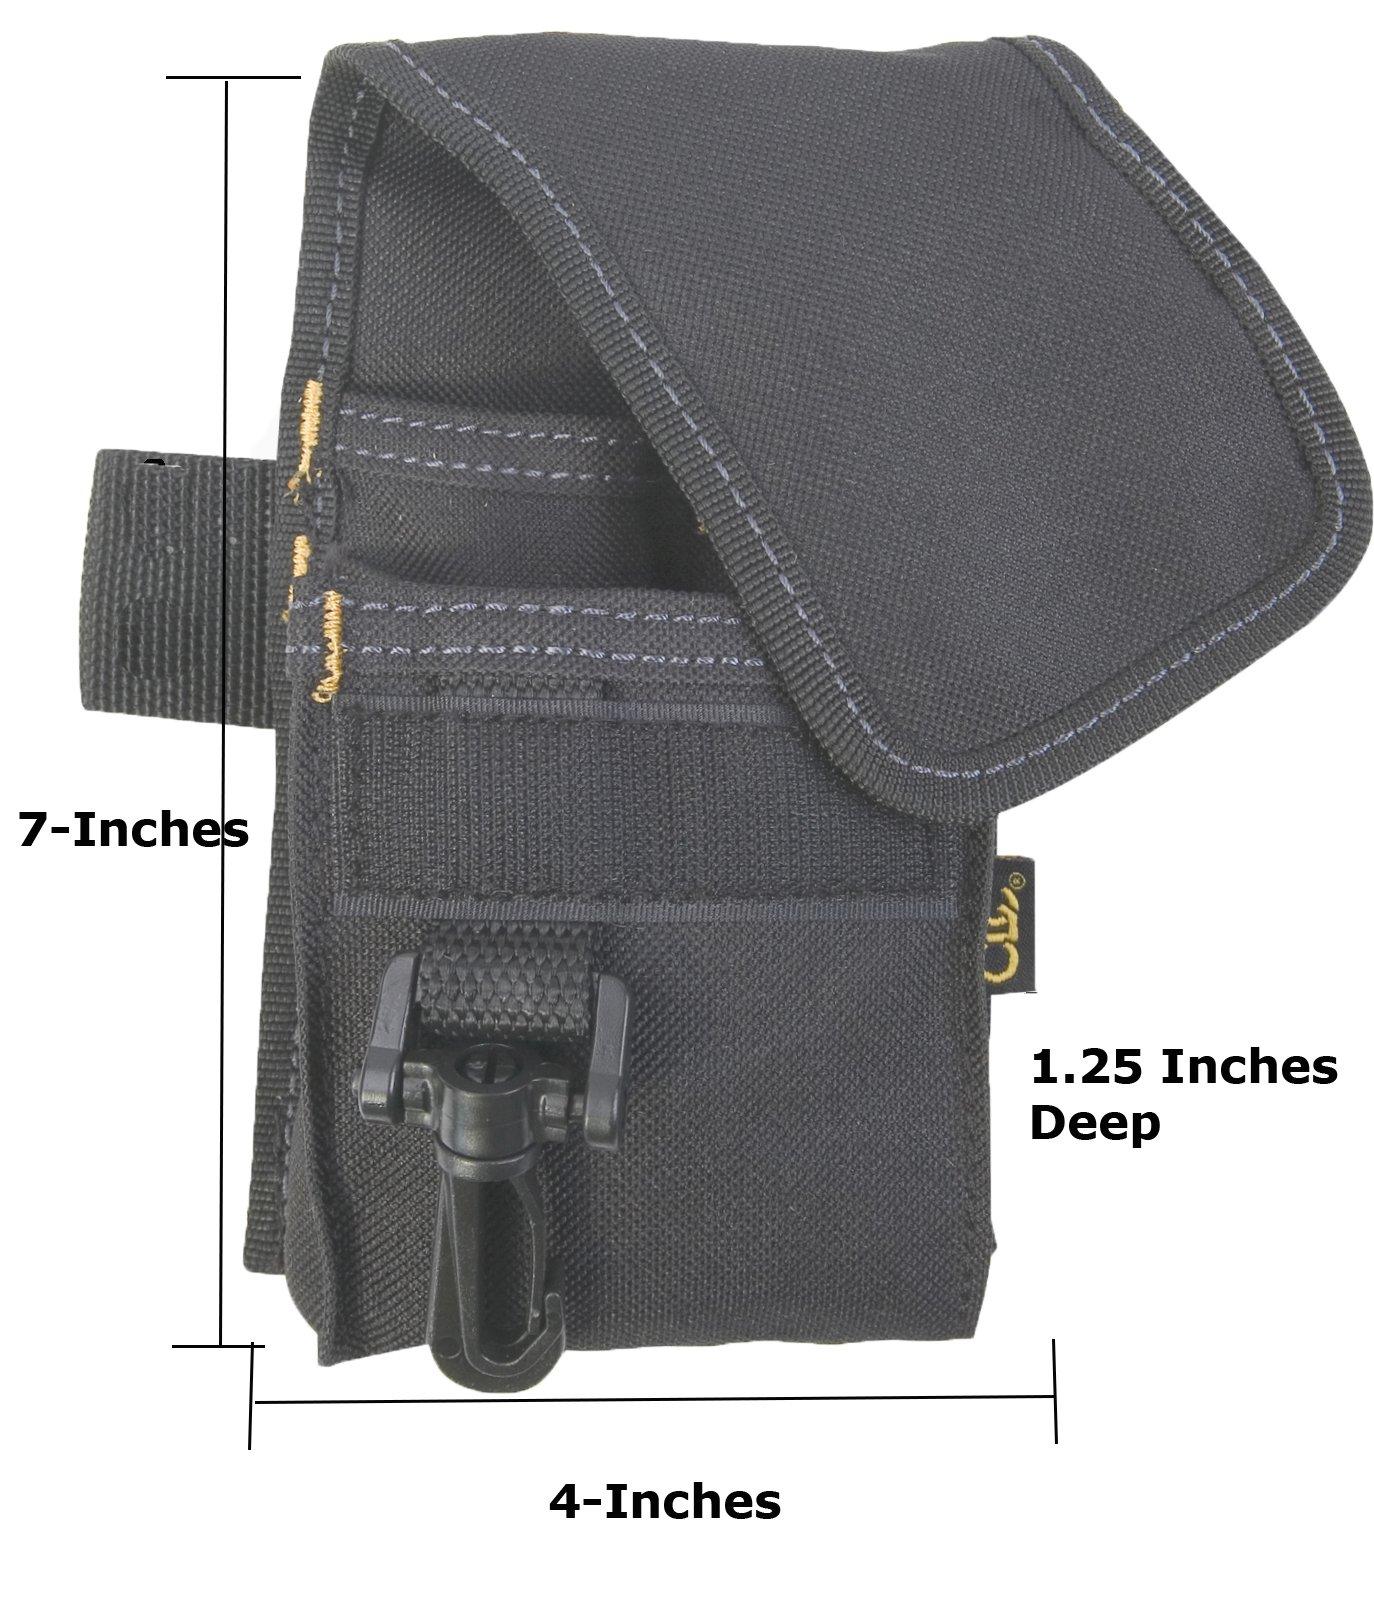 CLC Custom Leathercraft 1104 Construction Multi-Purpose Poly Tool Holder, Cell Phone Holder